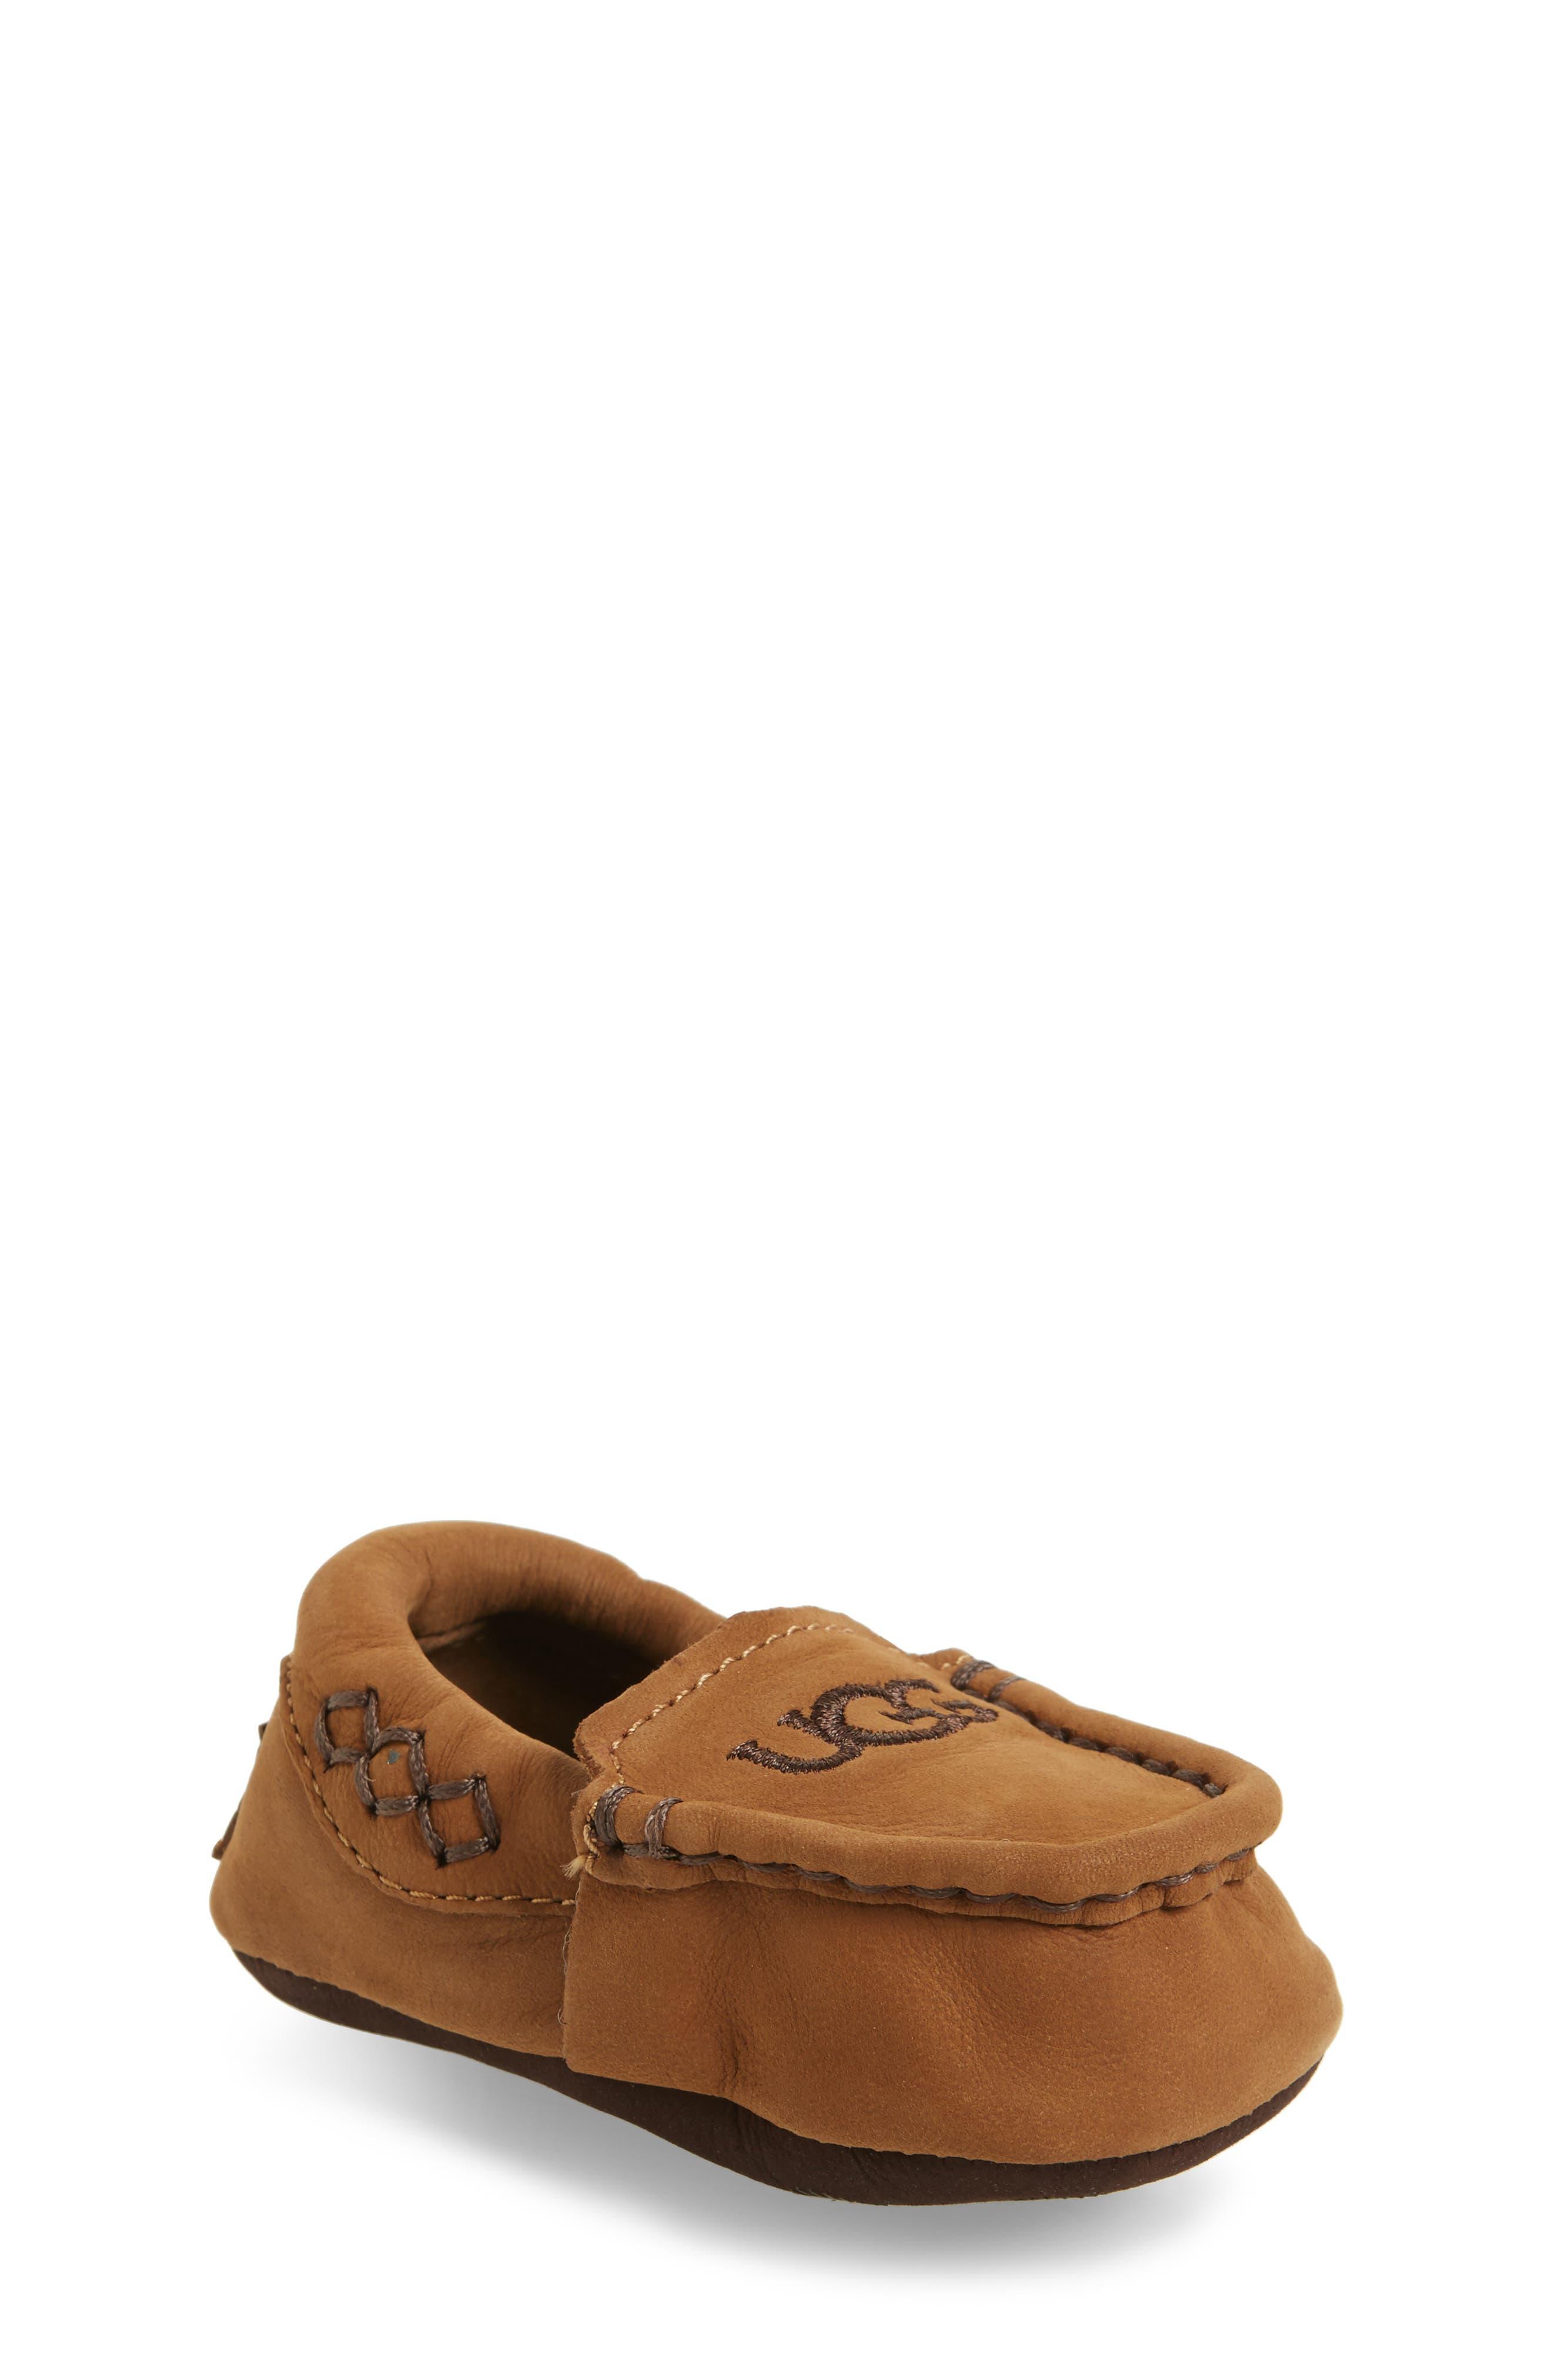 Sivia Loafer,                         Main,                         color, Chestnut